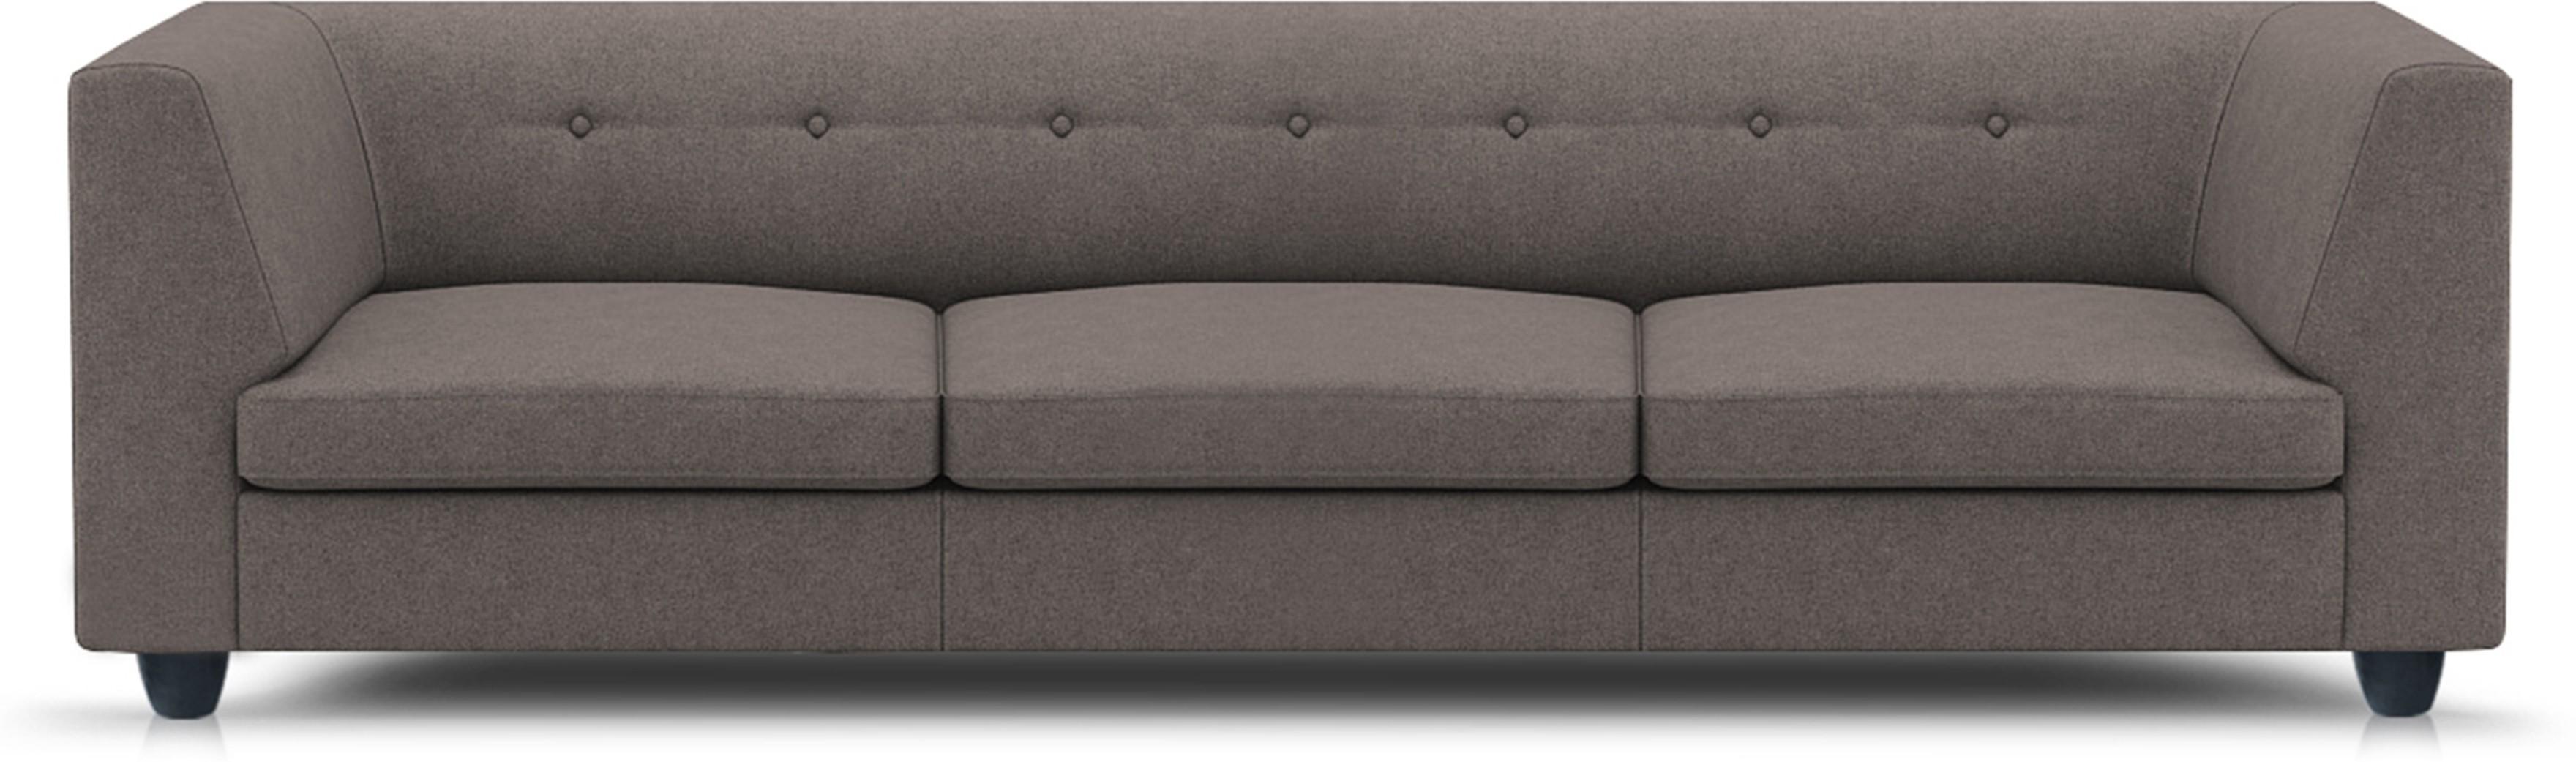 View Adorn homez Modern Solid Wood Sectional Grey Sofa Set Furniture (Adorn homez)